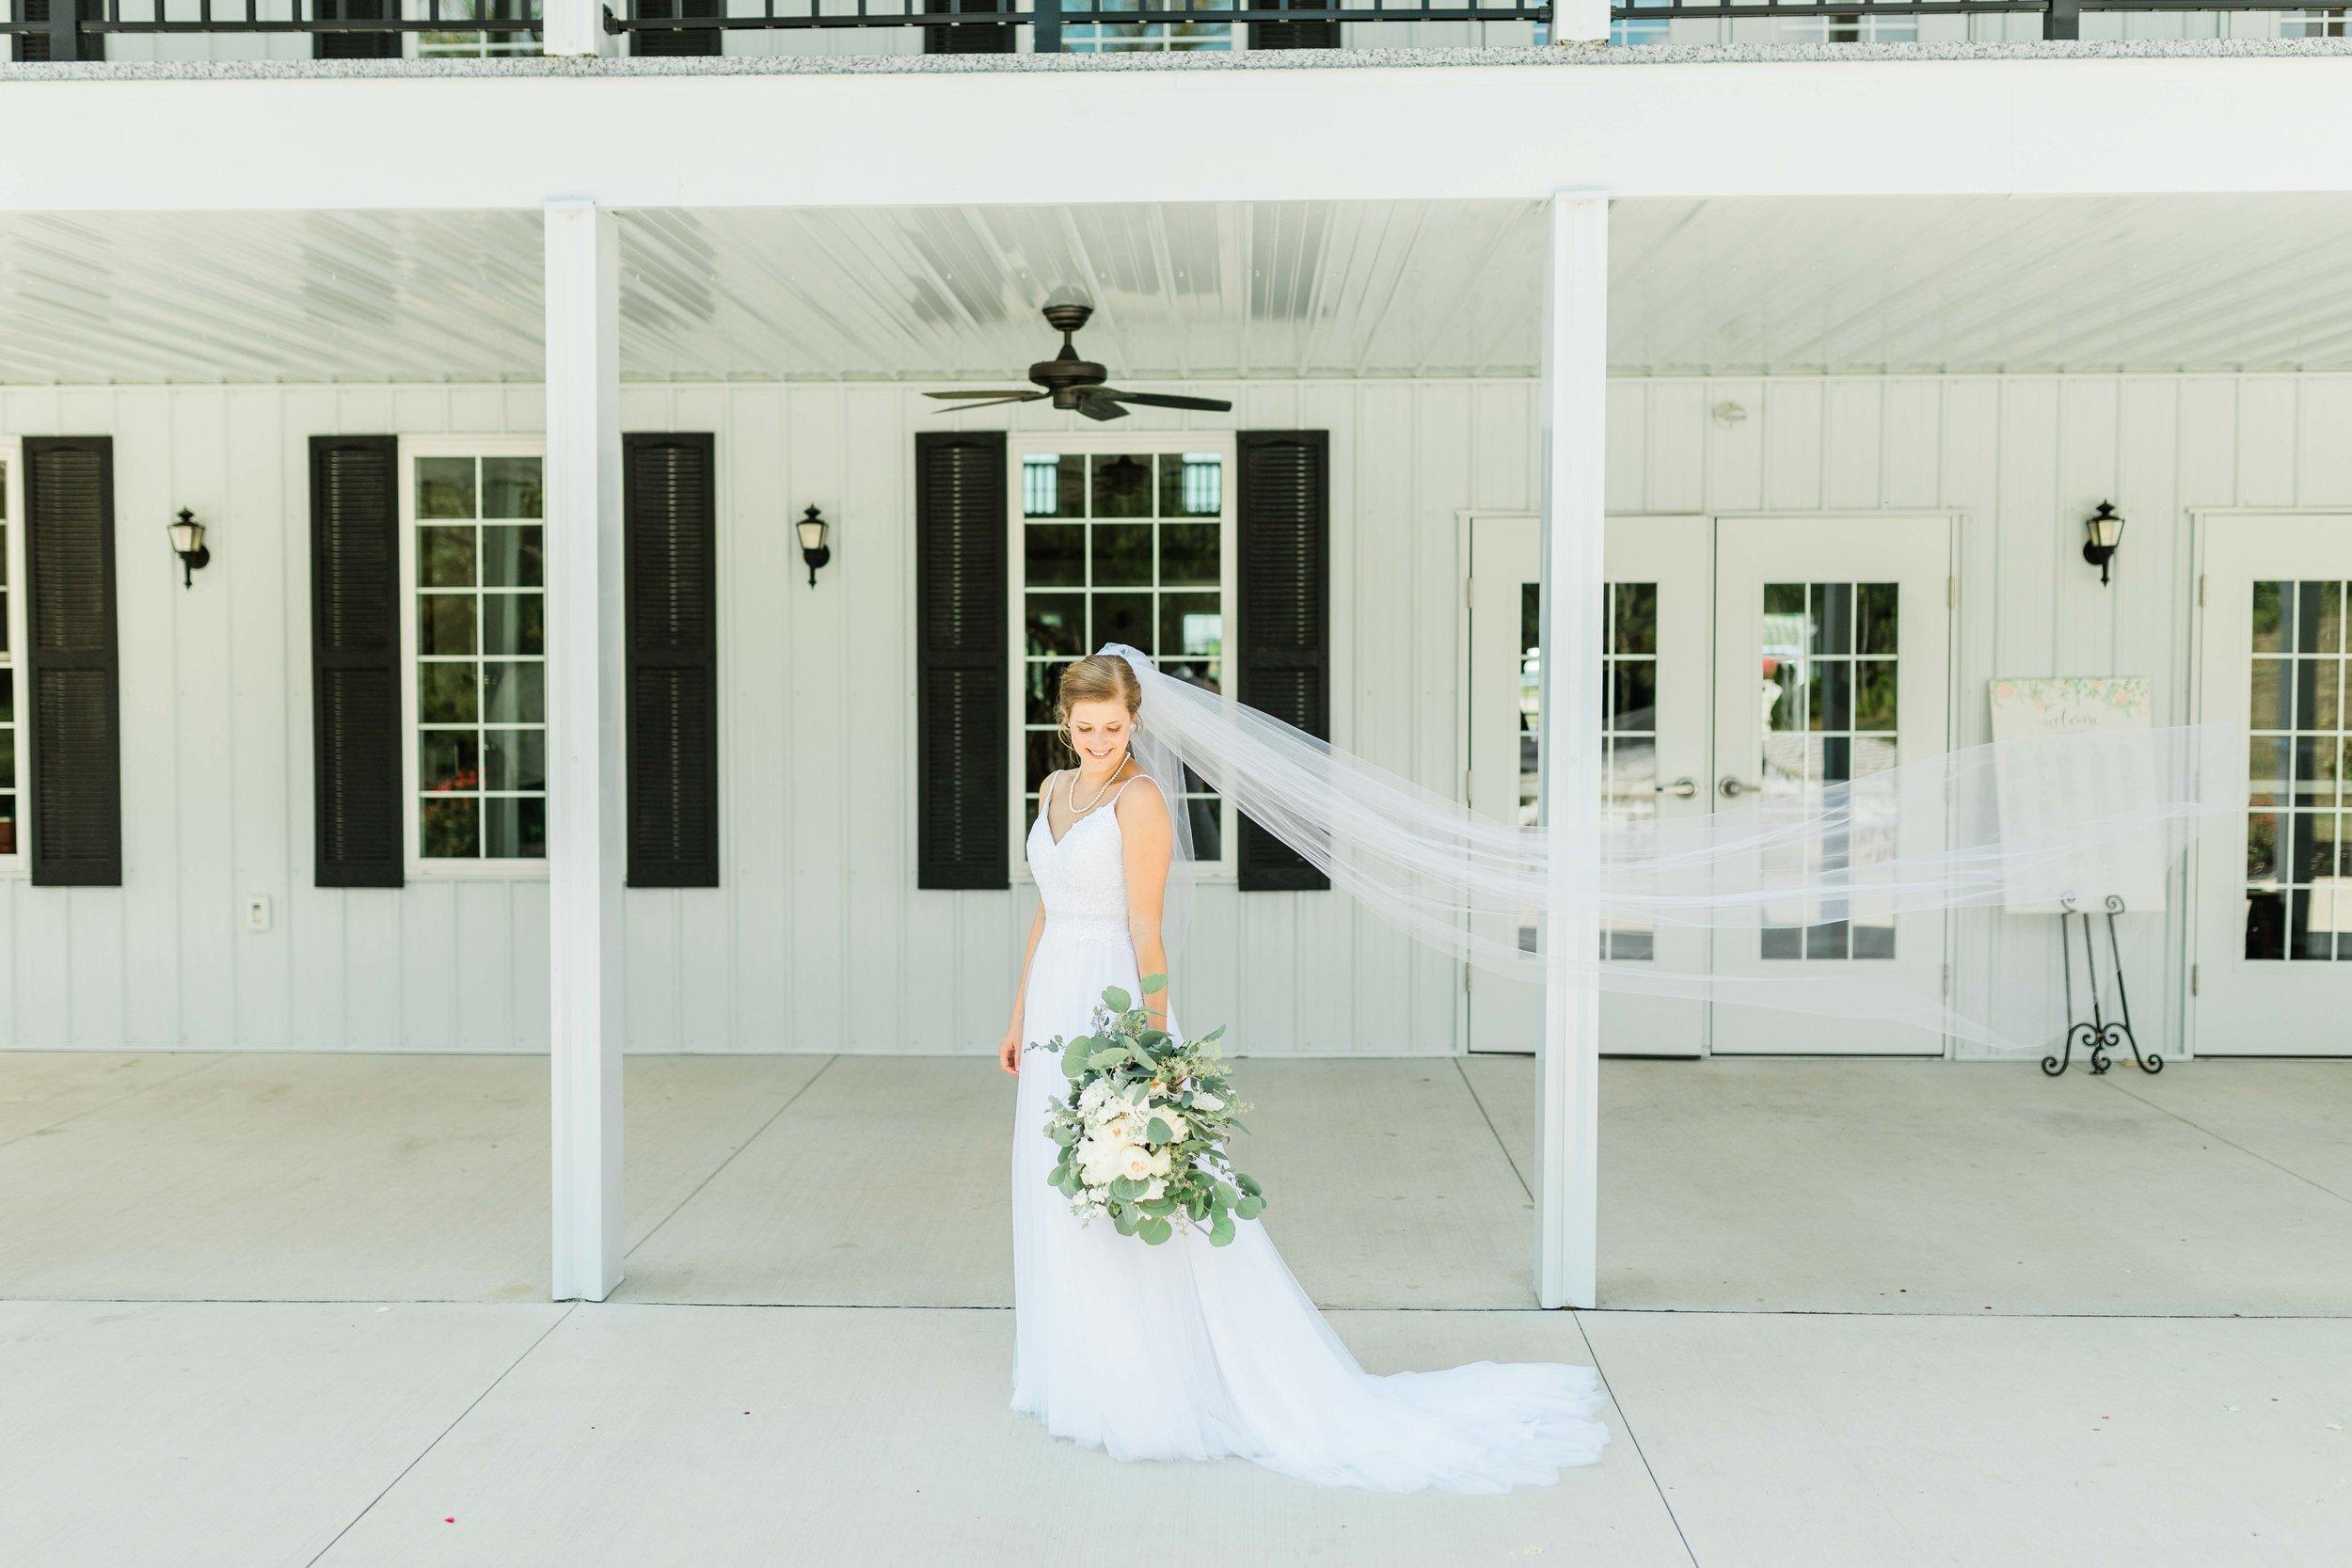 rosewood manor miamisburg ohio wedding-4.jpg